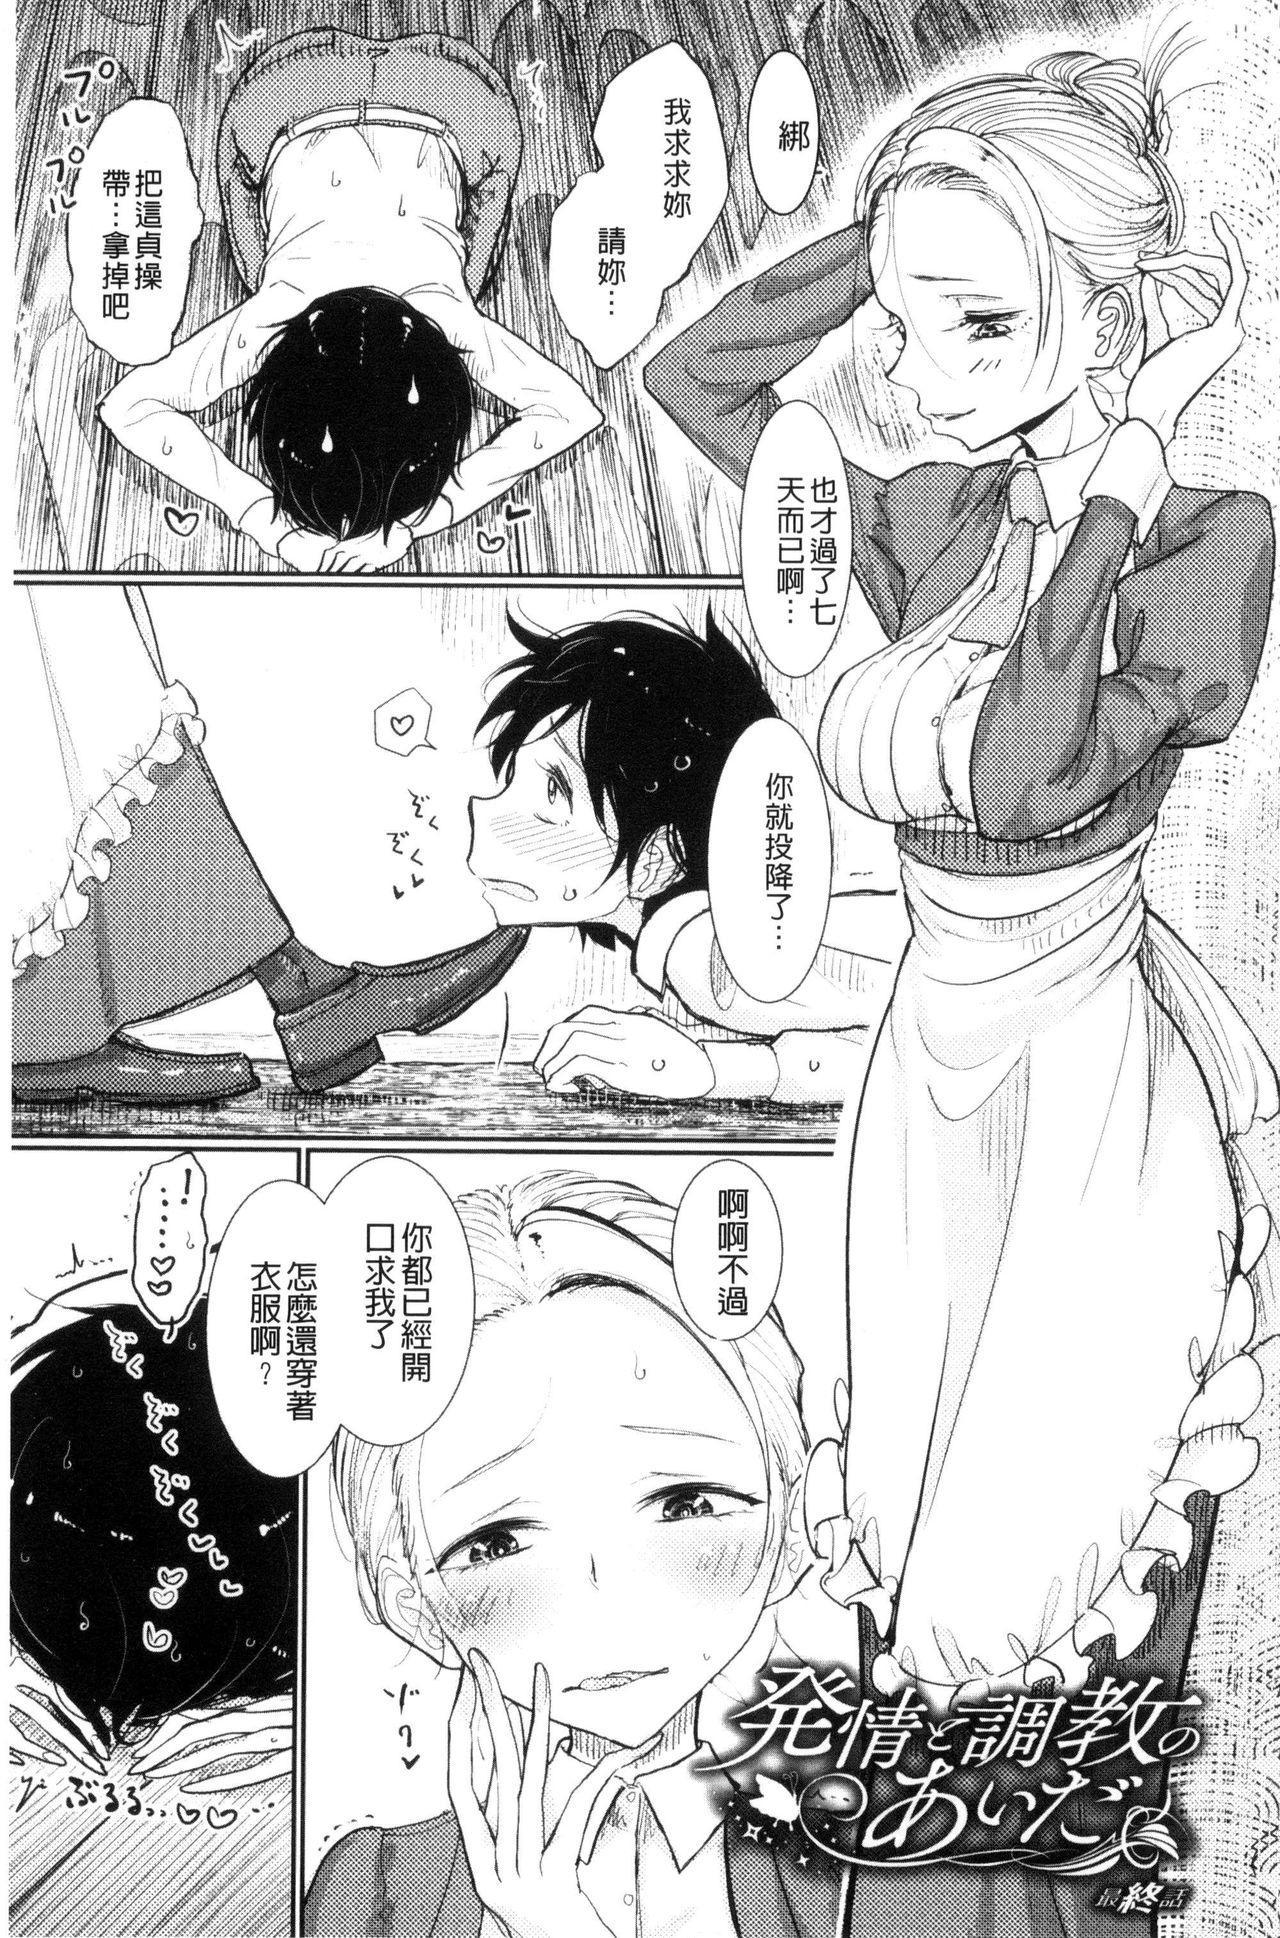 [Dhibi] Sono Yubisaki de Korogashite - Please Caress it at the Finger-tip. [Chinese] 44